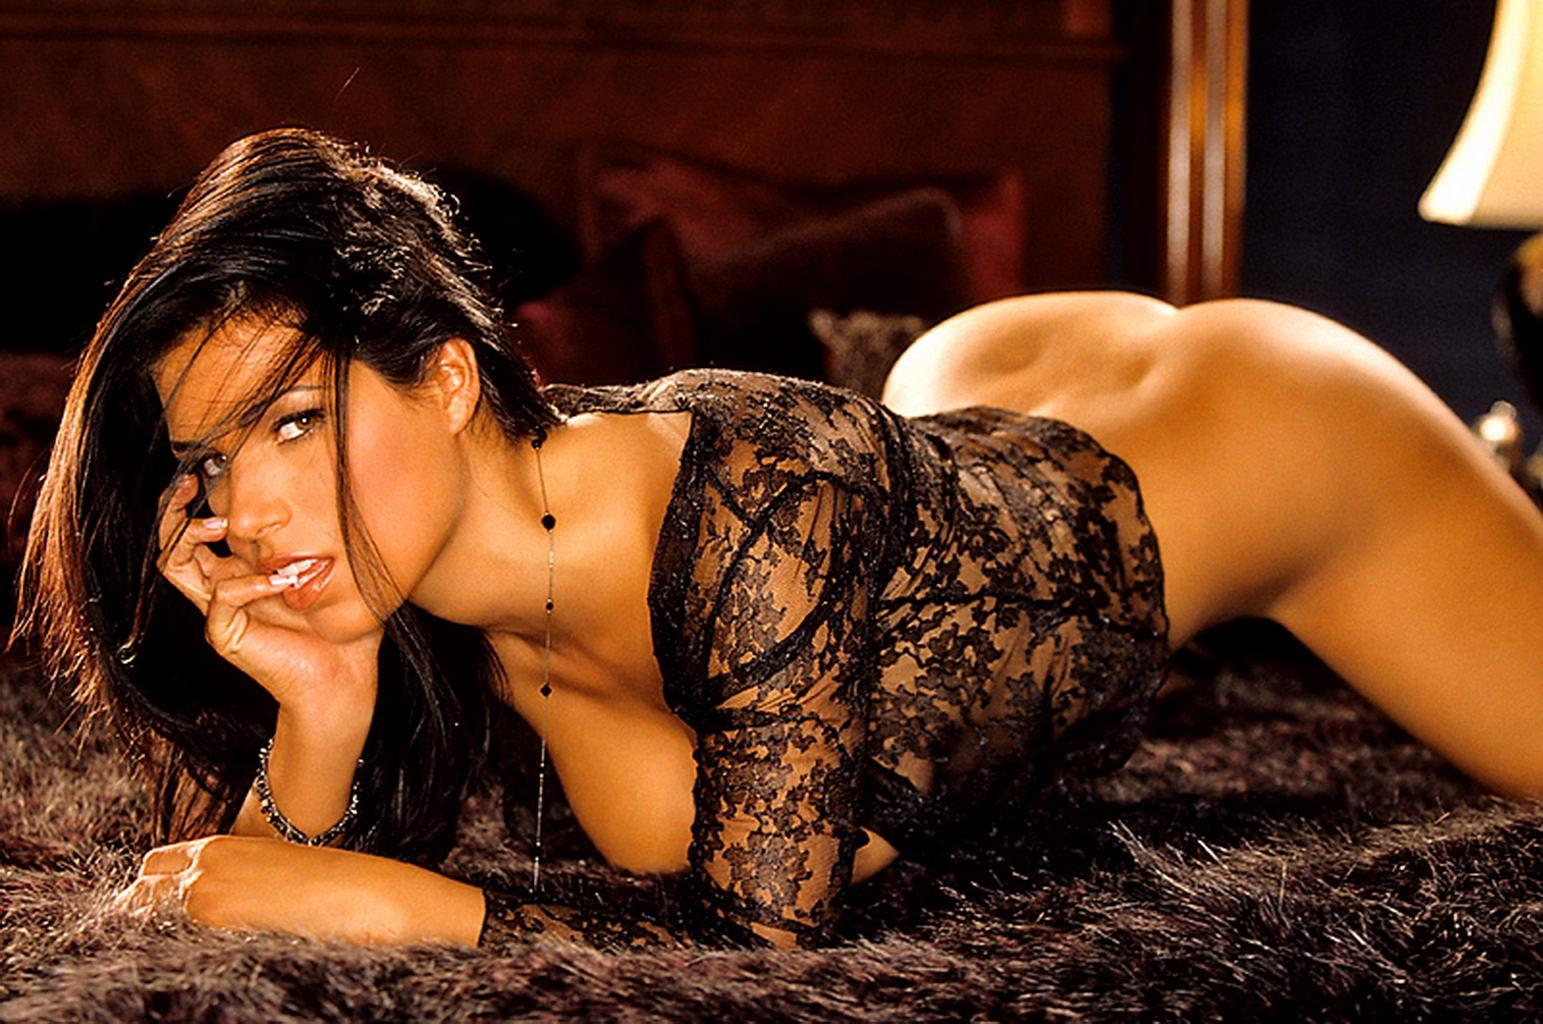 Miss September 2006 Janine Habeck Pichunter